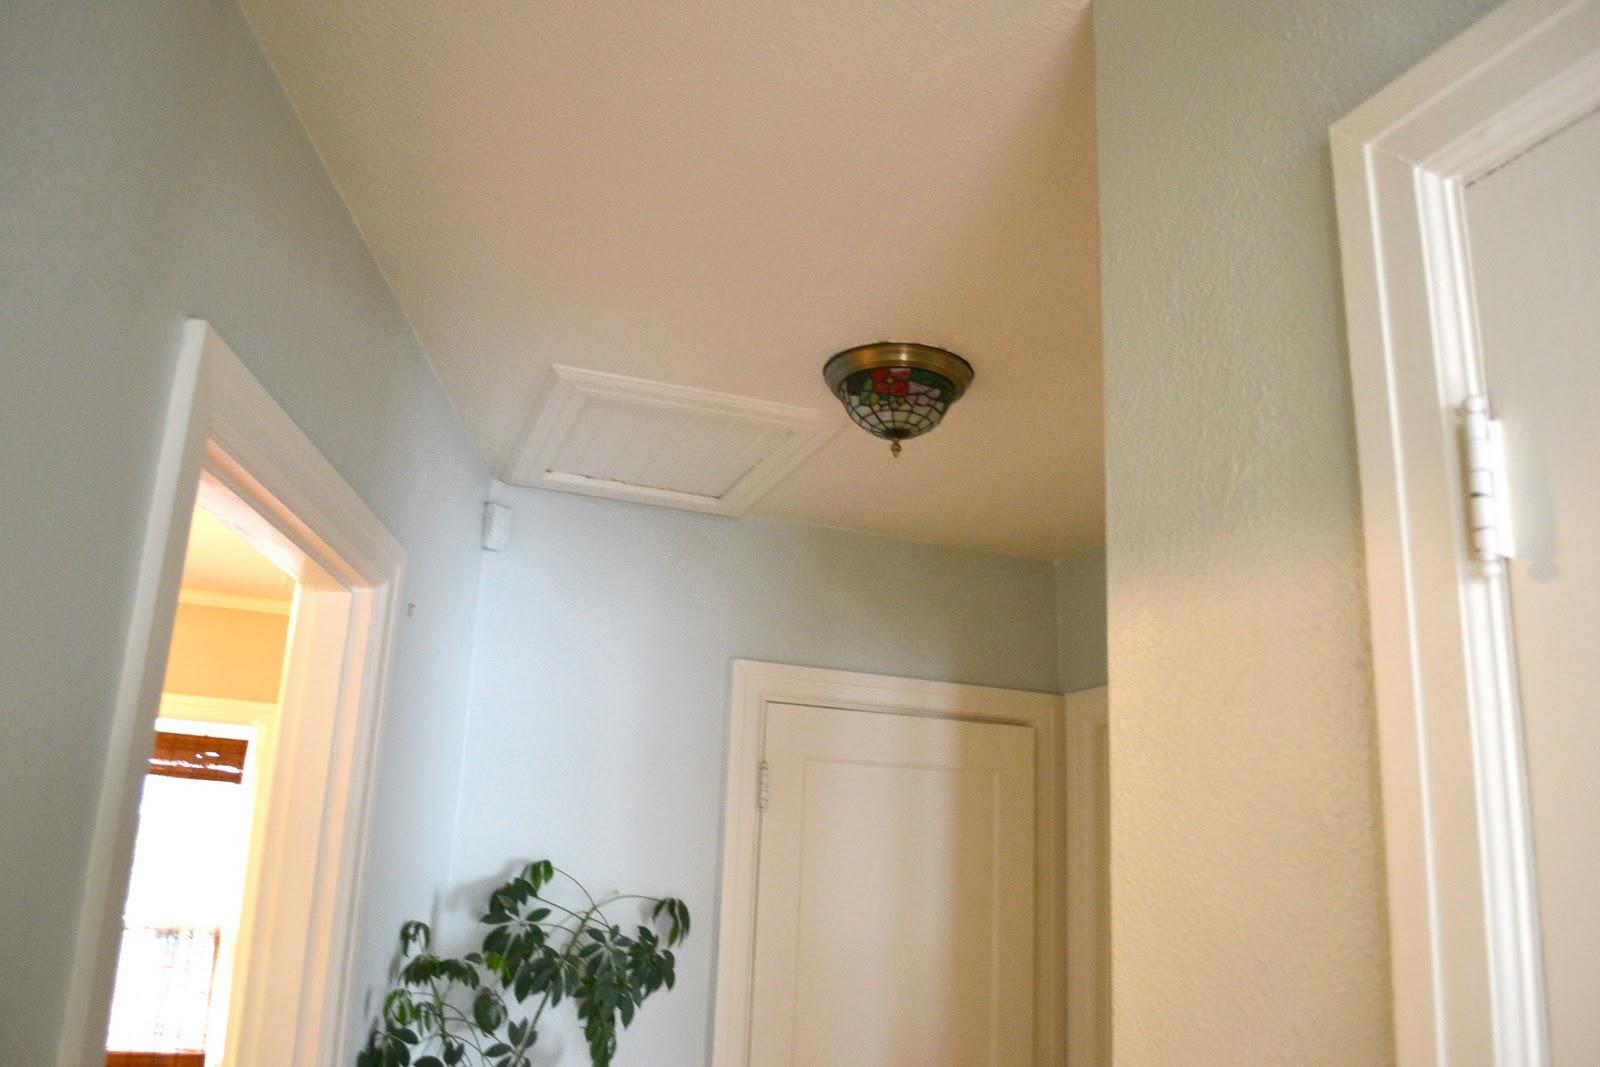 Hallway Lighting A Home In The Making Renovate Hallway Lighting